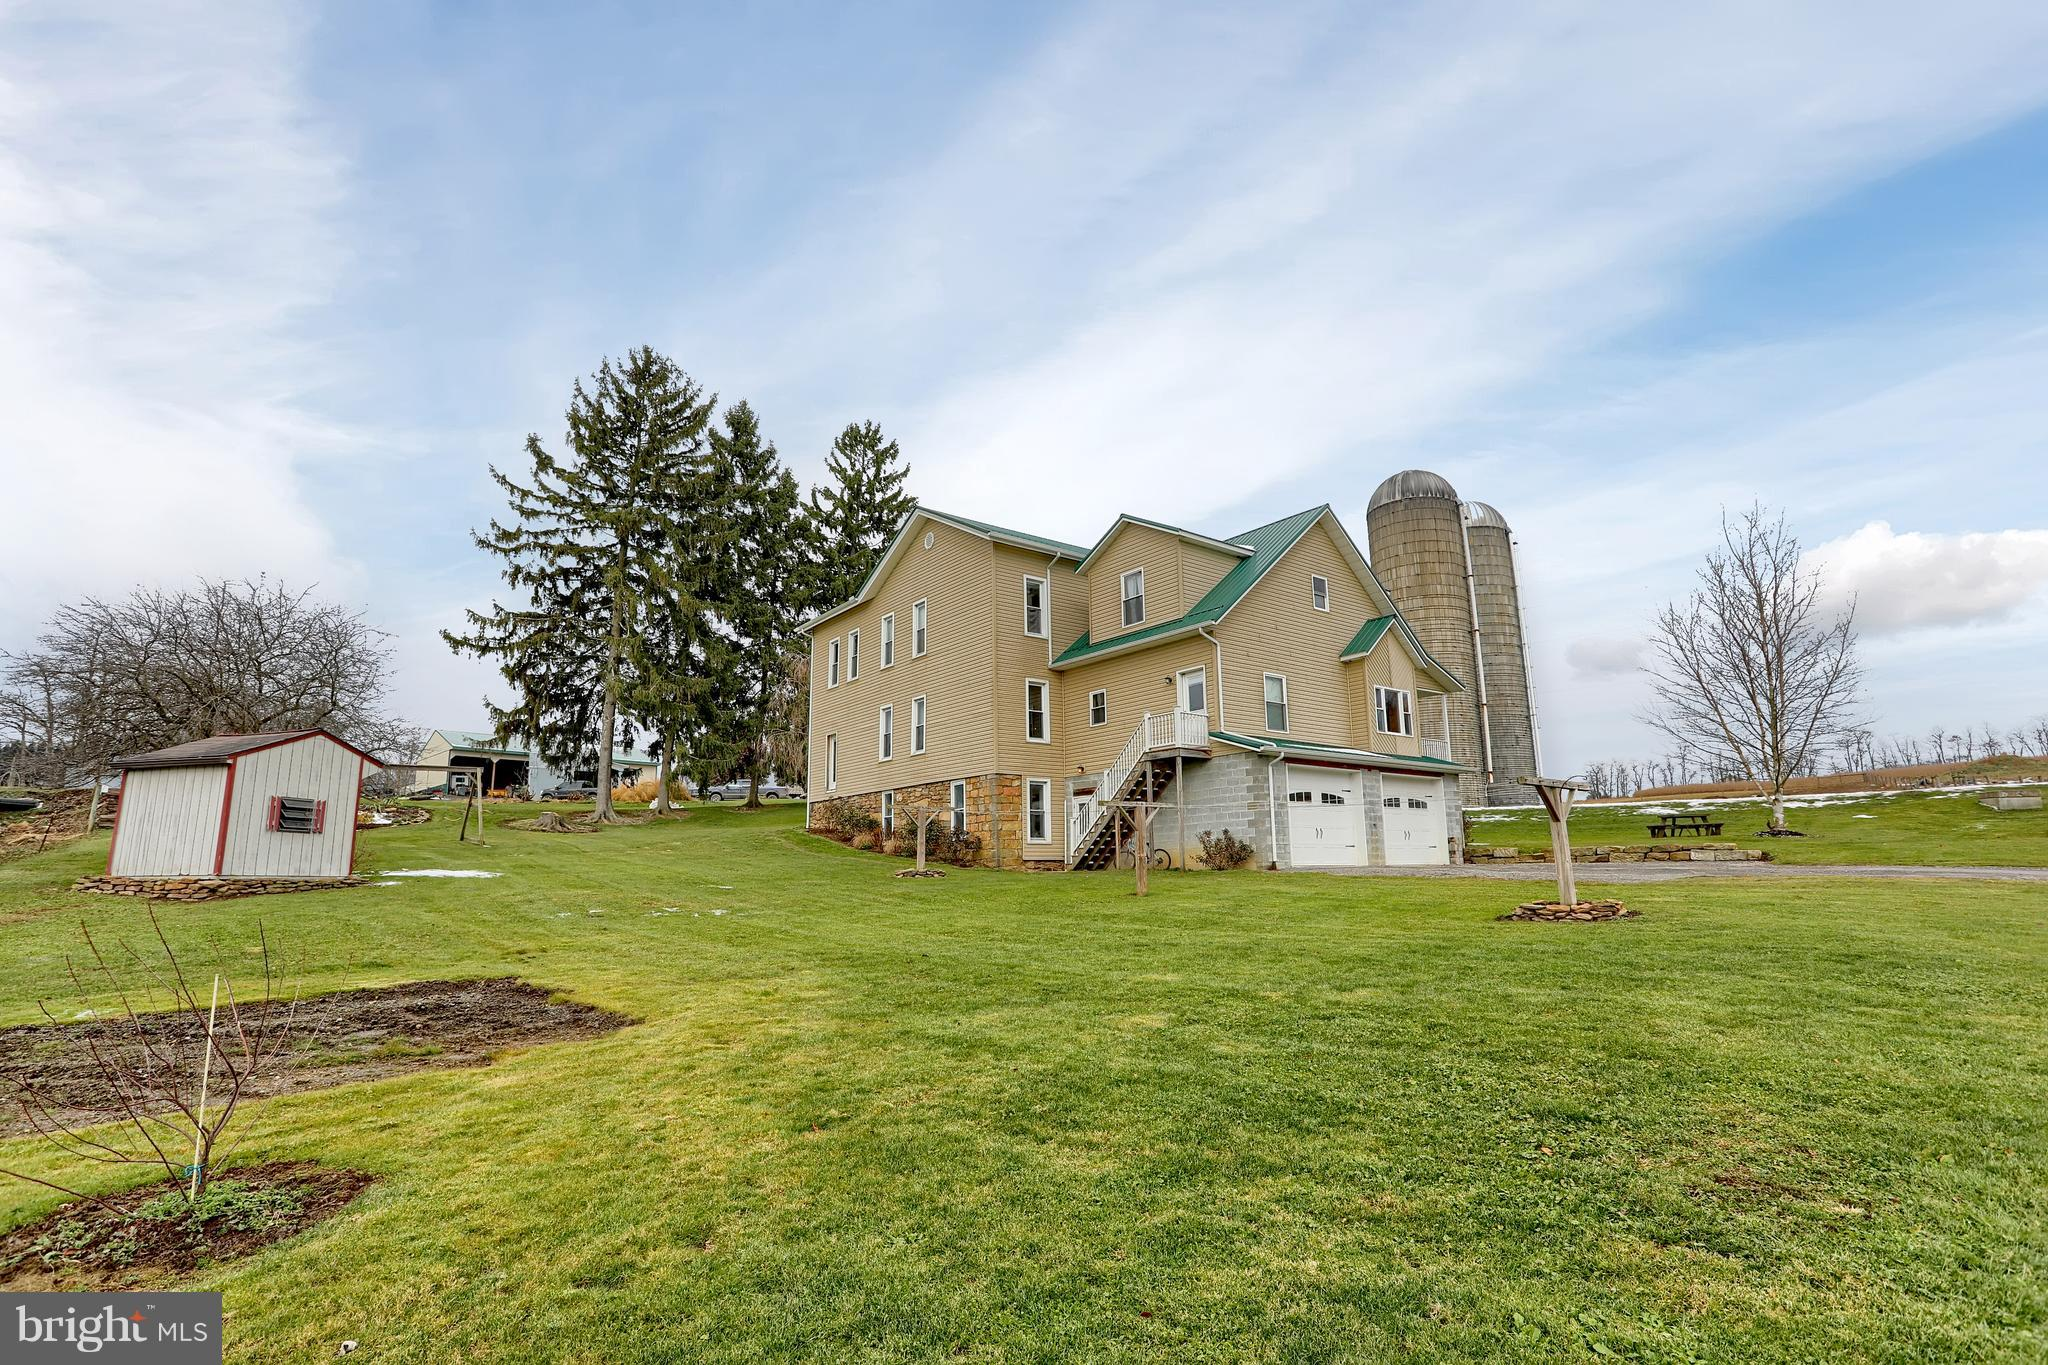 273 Mcvicker Rd, Stoystown, PA, 15563